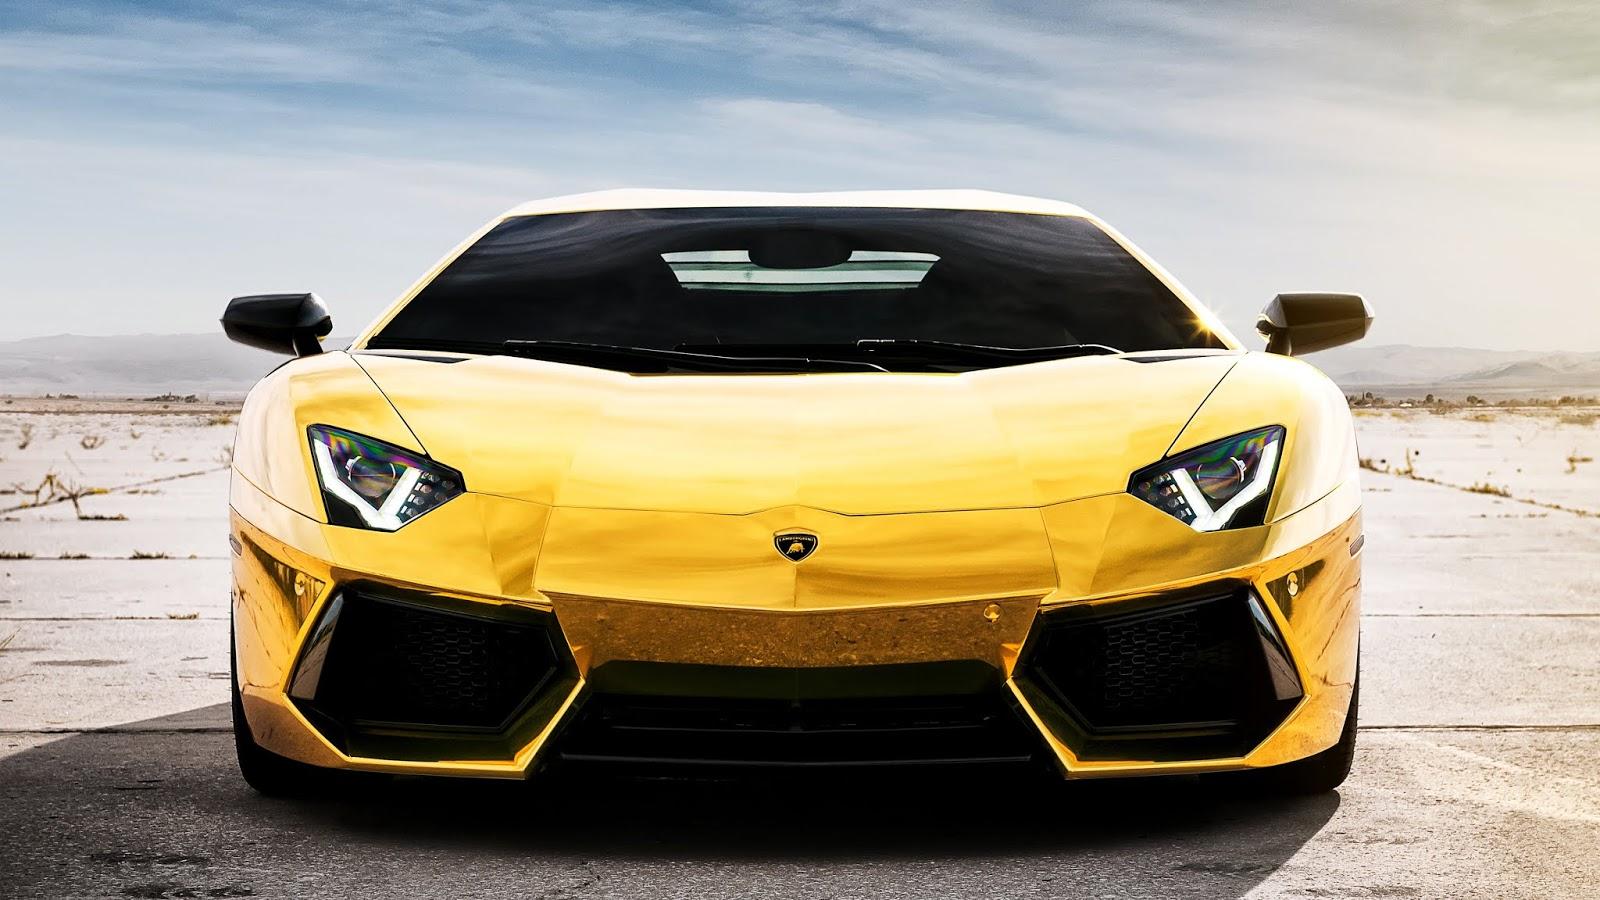 ,wonderful Cars, 4K Wallpapers, خلفيات سيارات رائعة,Wallpapers,Wallpapers Cars, خلفيات سيارات,